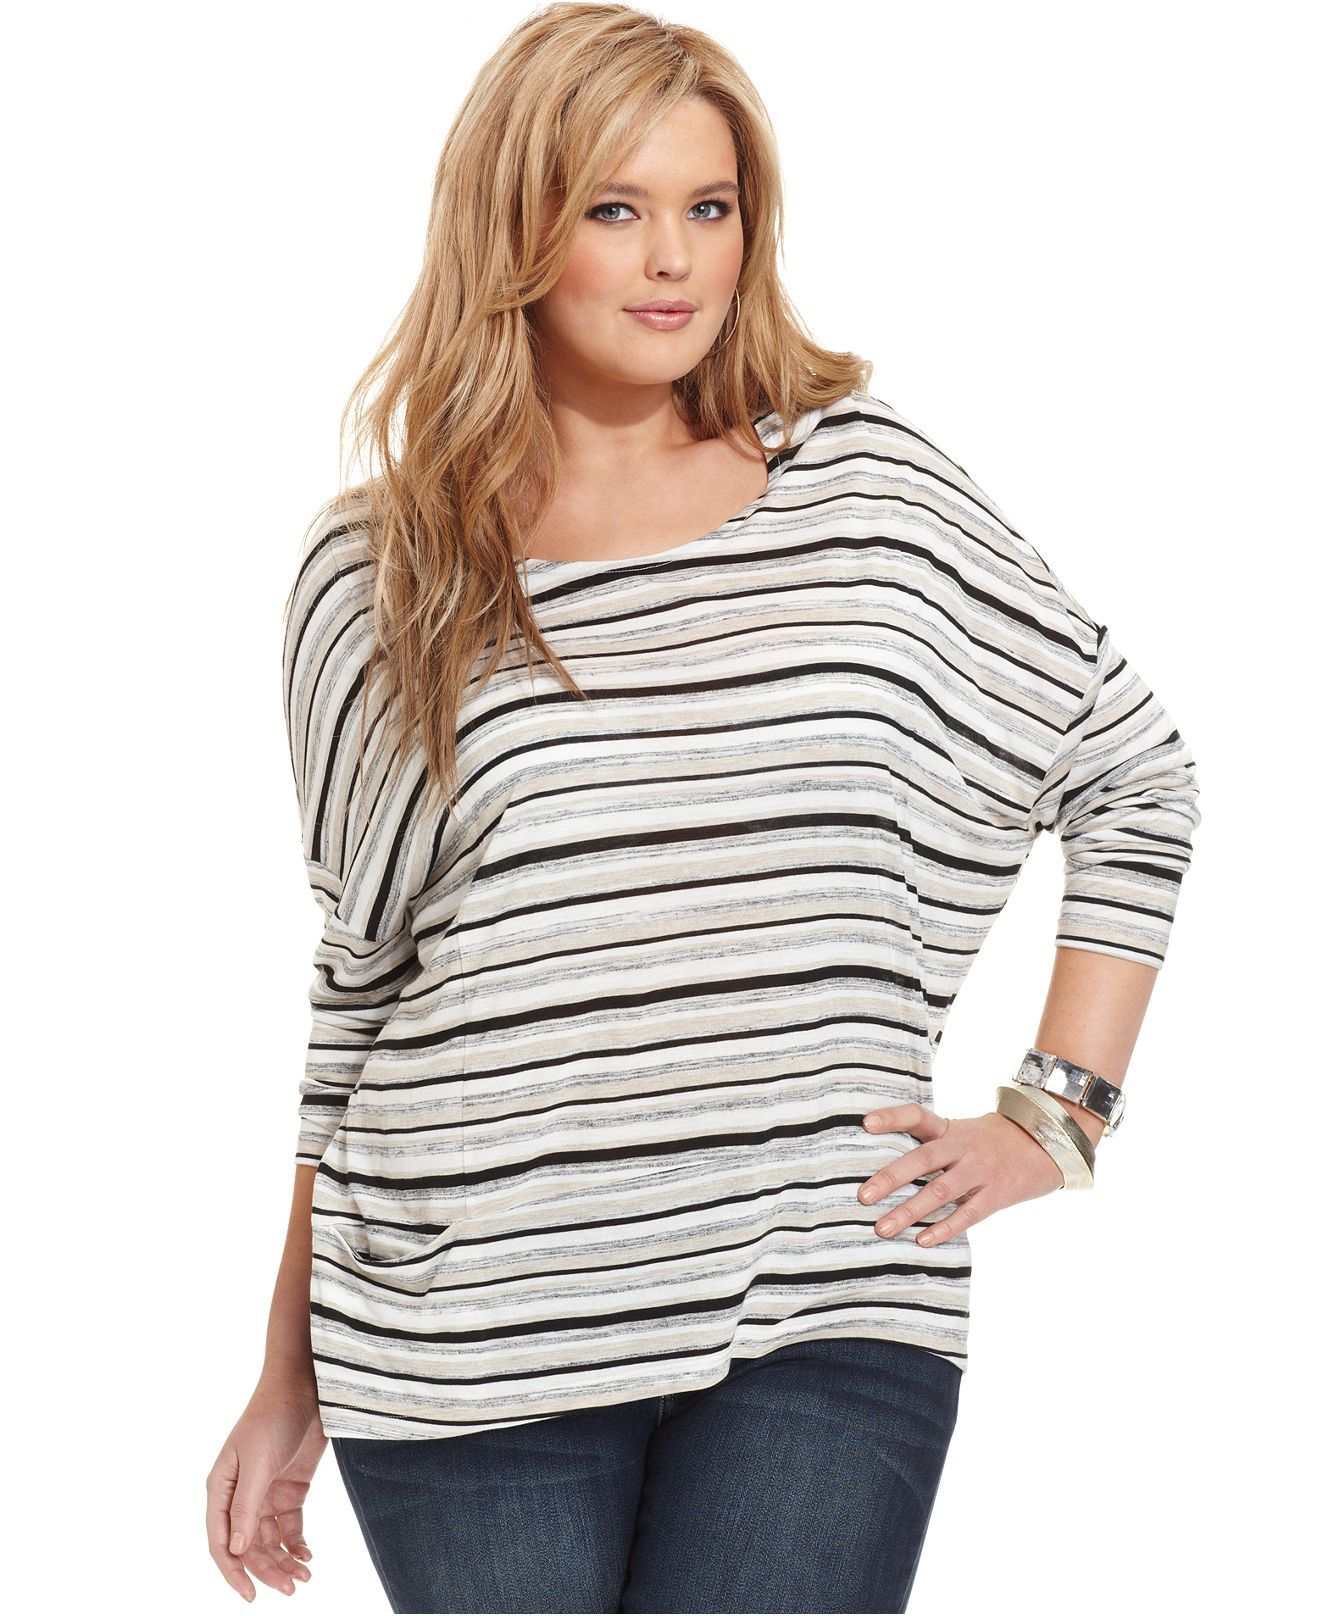 Cha Cha Vente Plus Size Top, Three-Quarter-Sleeve Striped - Plus Size Tops - Plus Sizes - Macys